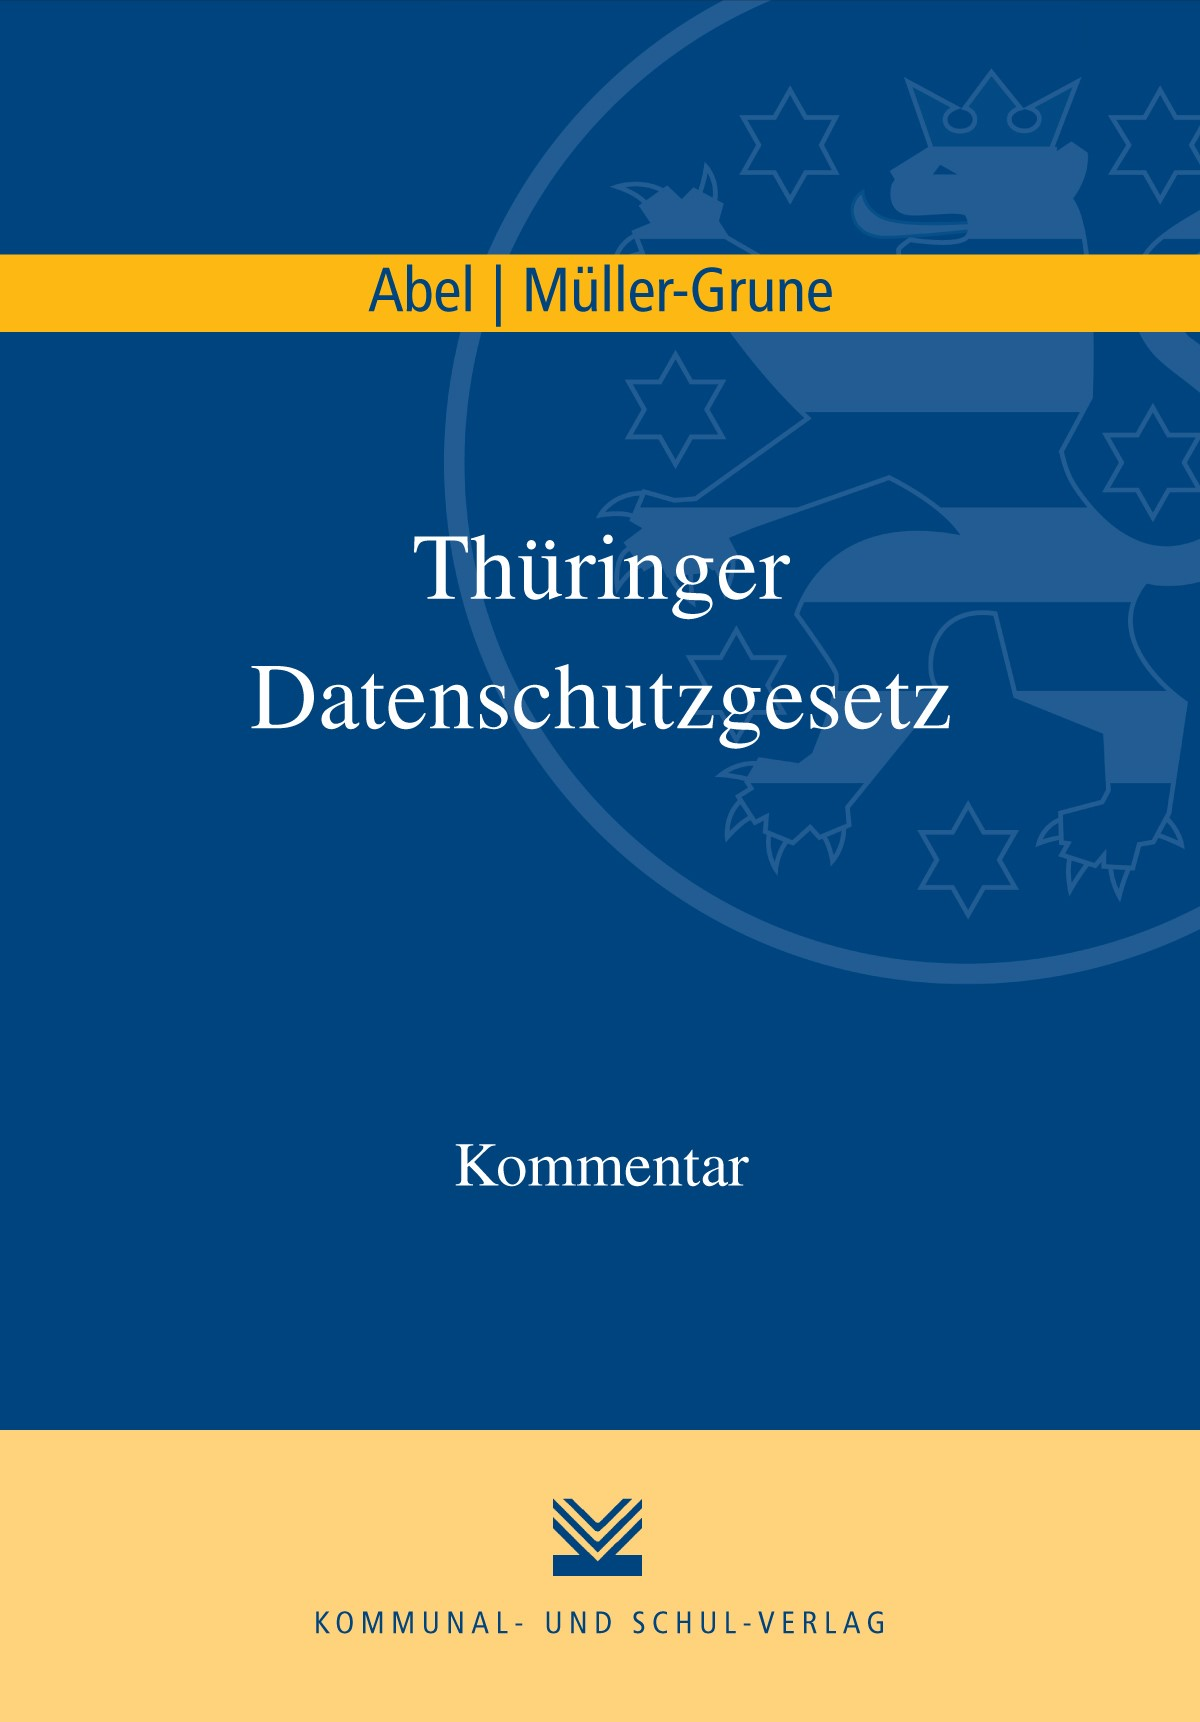 Thüringer Datenschutzgesetz | Abel / Müller-Grune, 2016 | Buch (Cover)